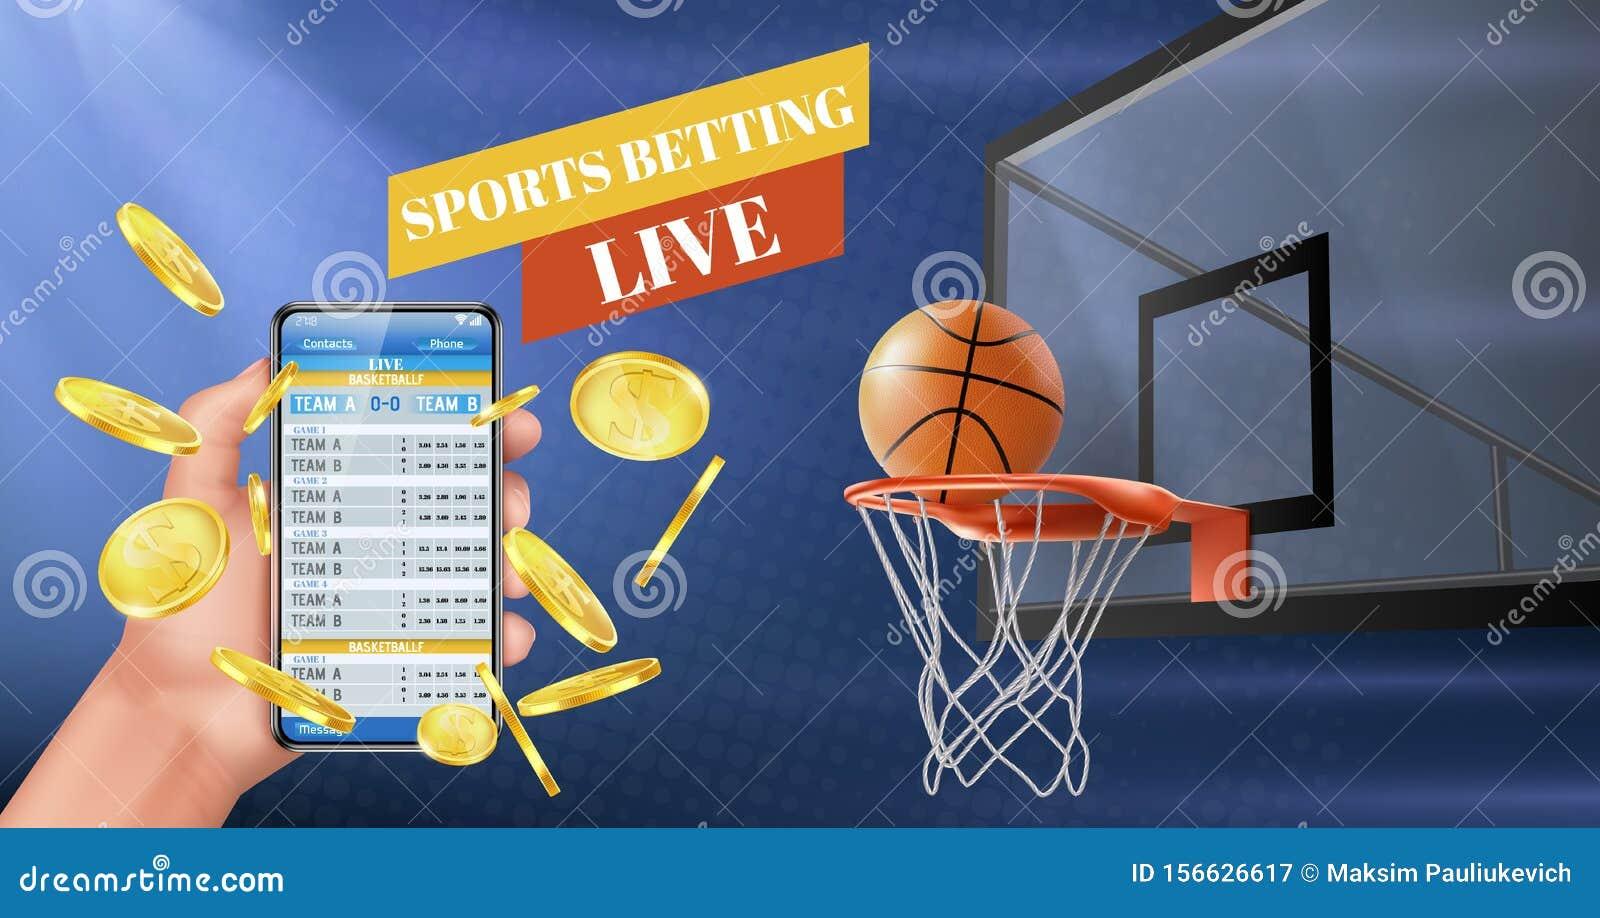 Sport betting banner best spread betting forum